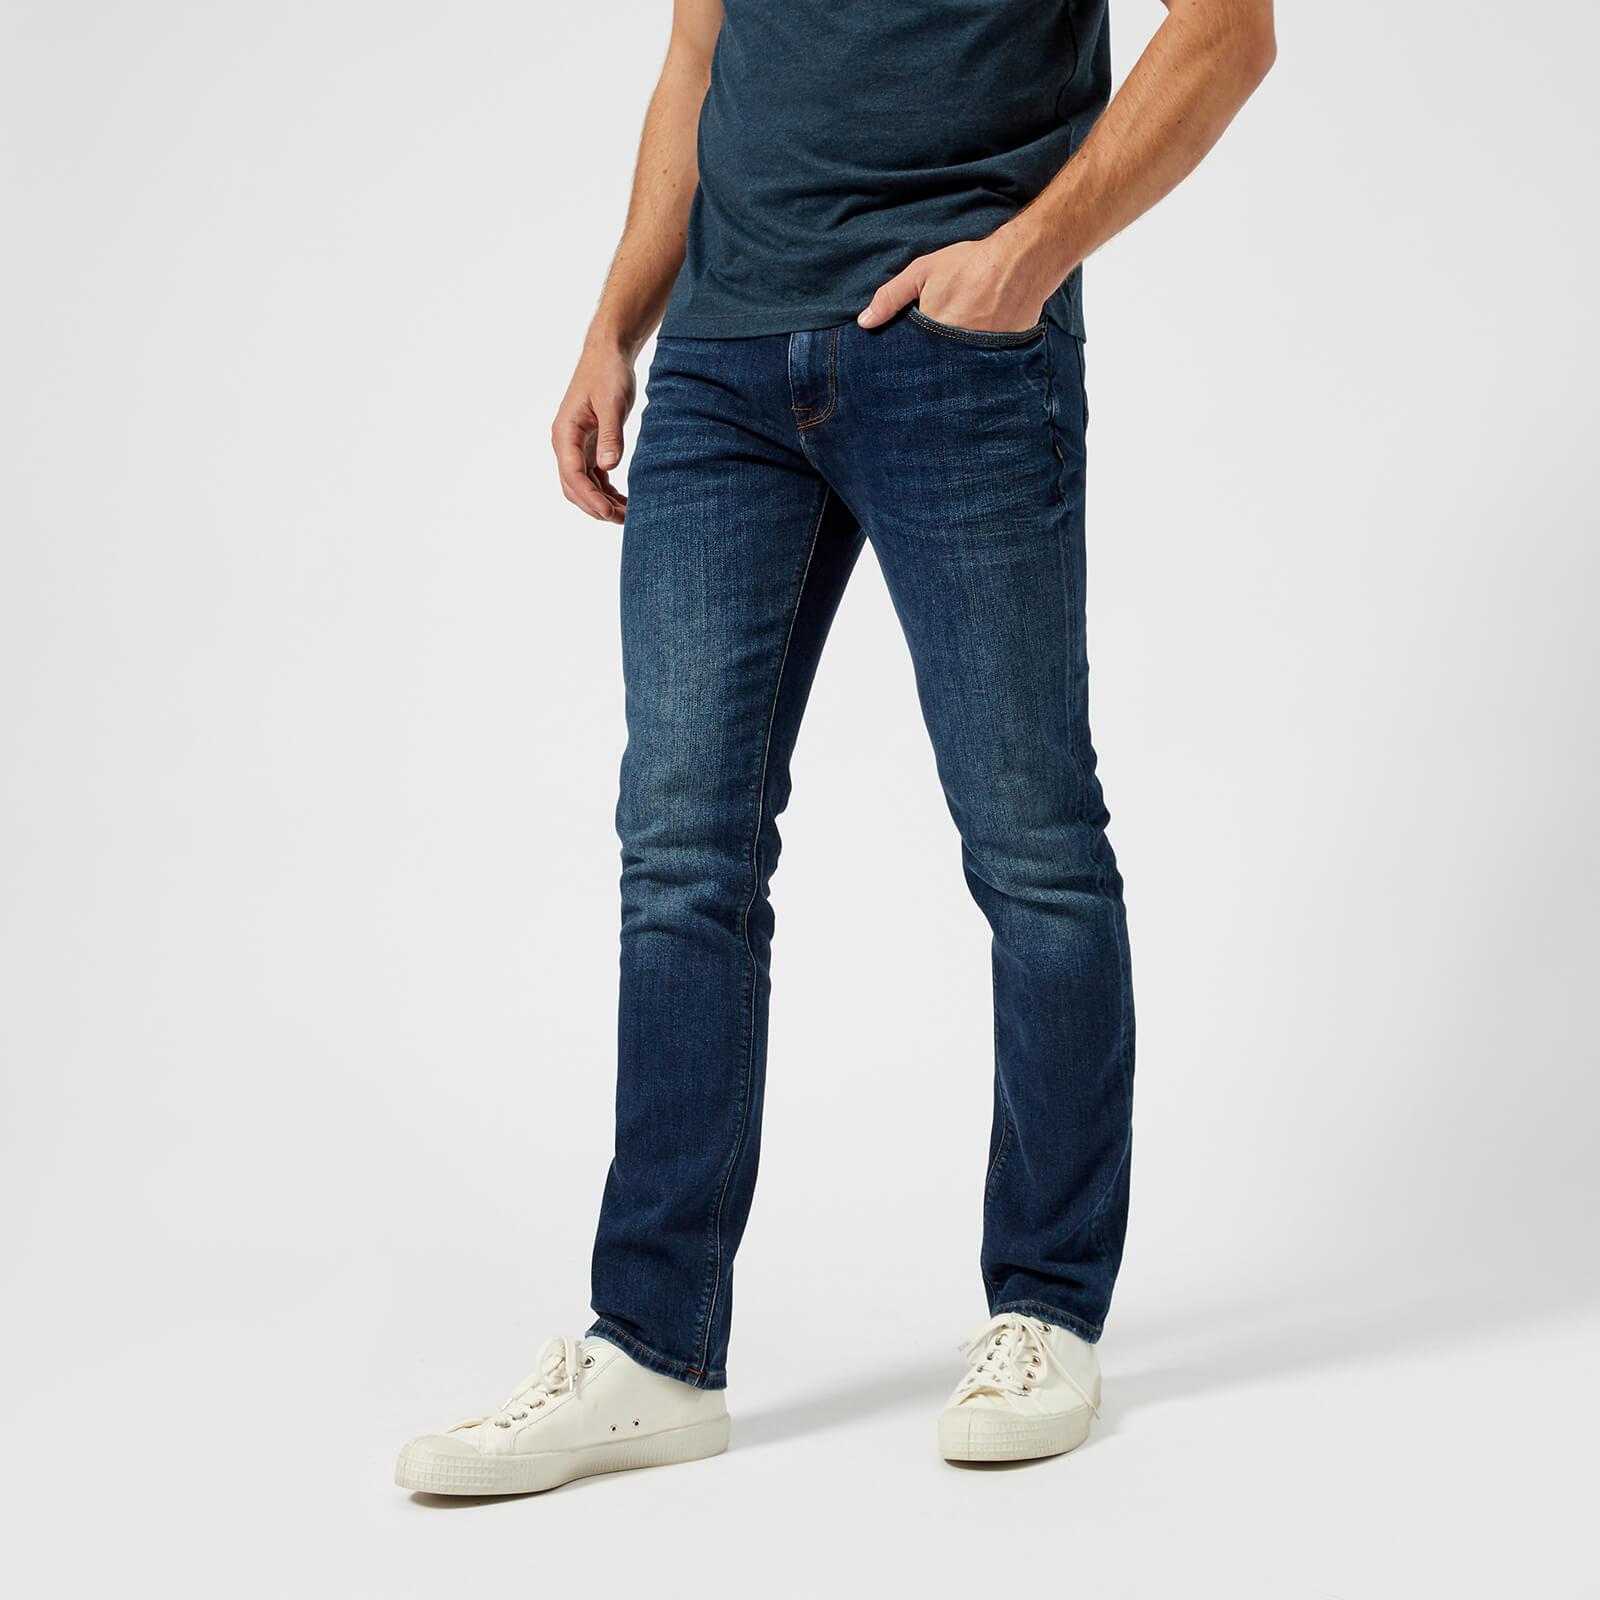 Tommy Hilfiger Men's Core Denton Straight Jeans - New Dark Stone - W38/L32